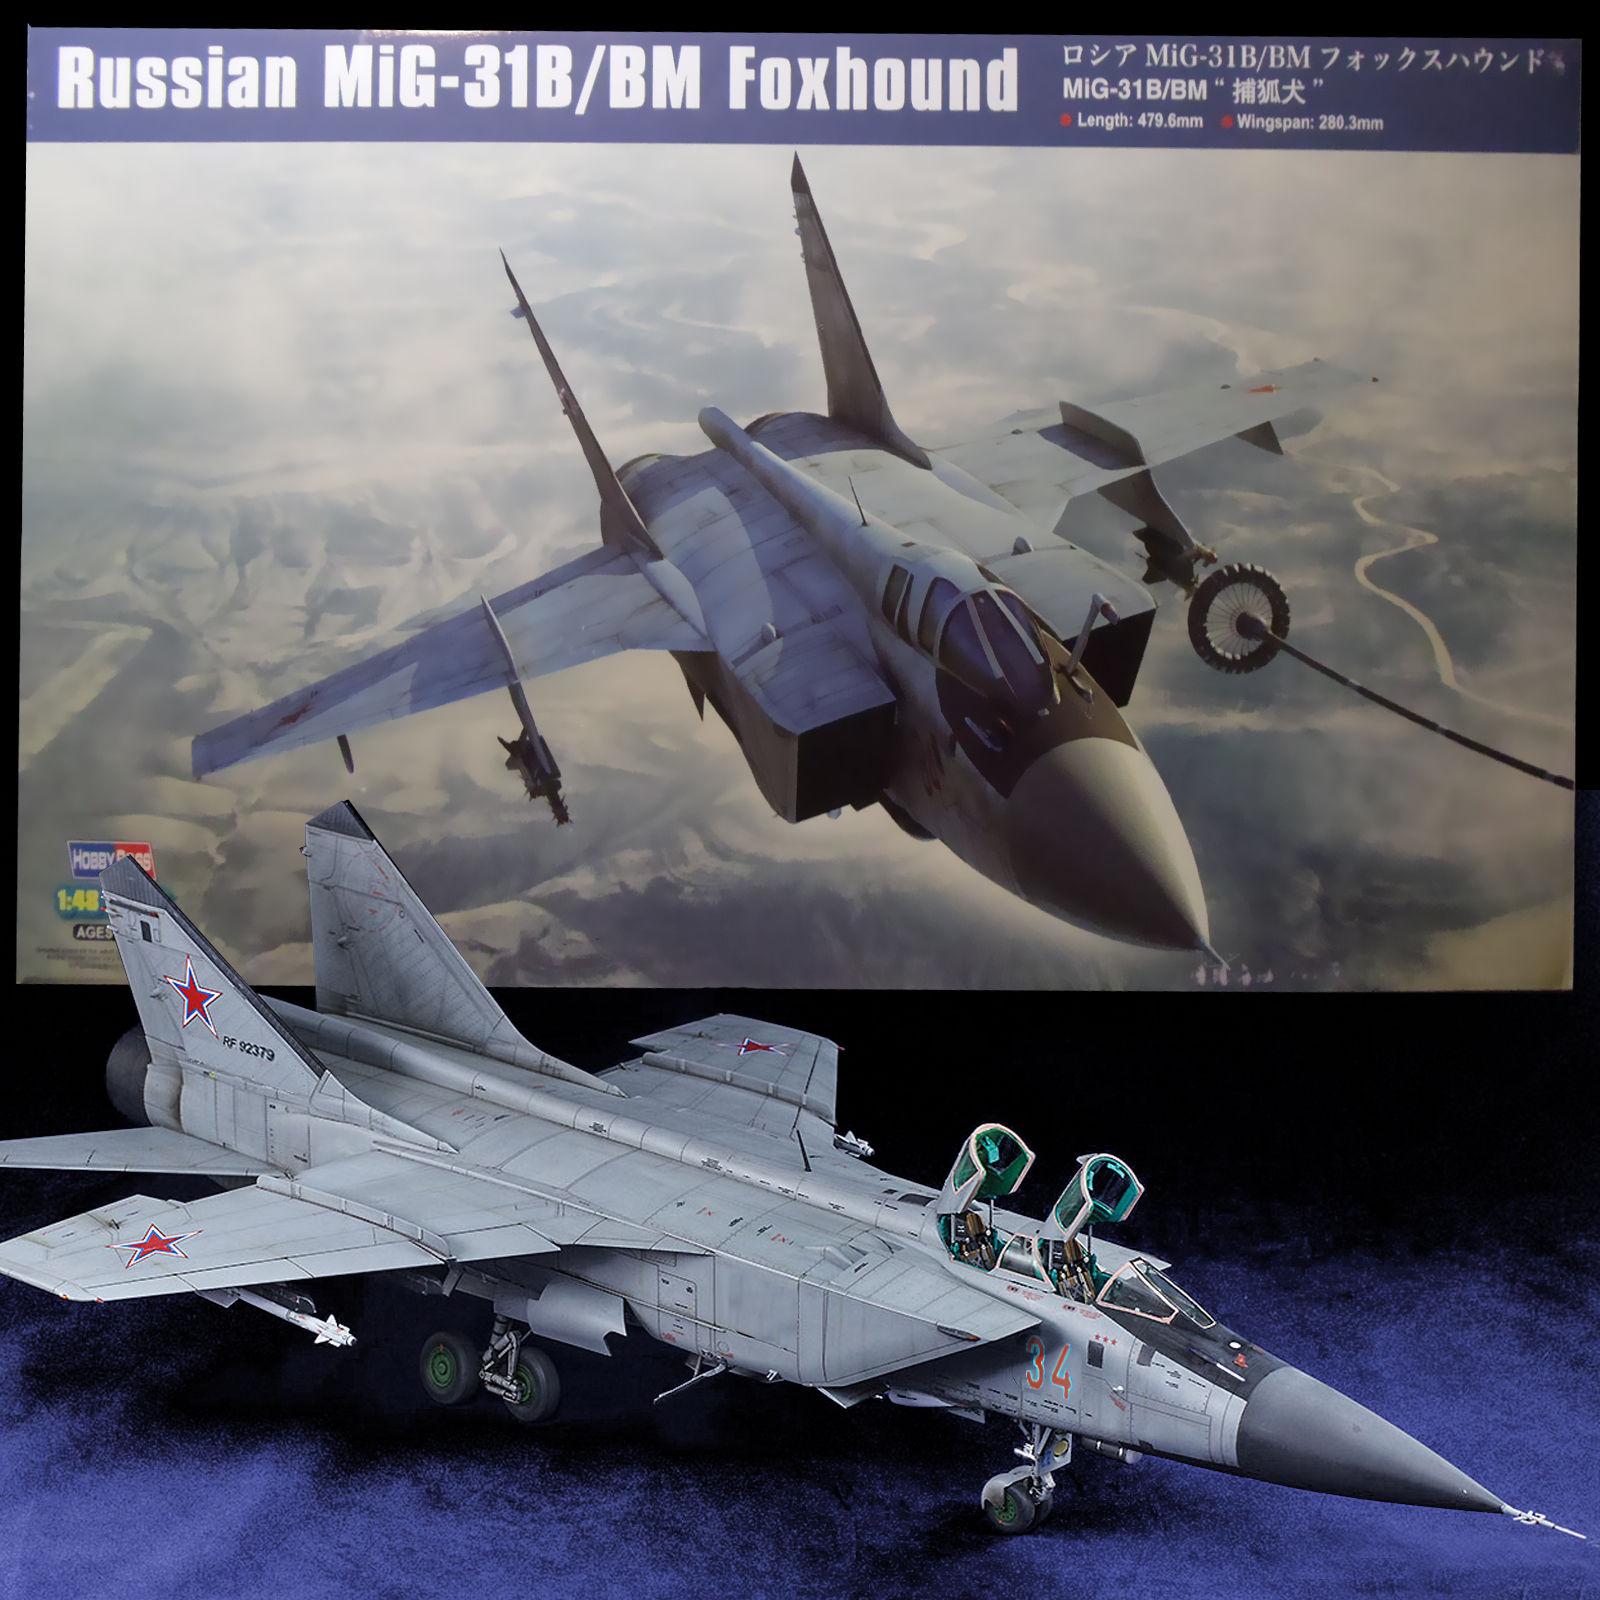 Hobbyboss 1/48 Russian Mig-31B/BM Foxhound # 81754